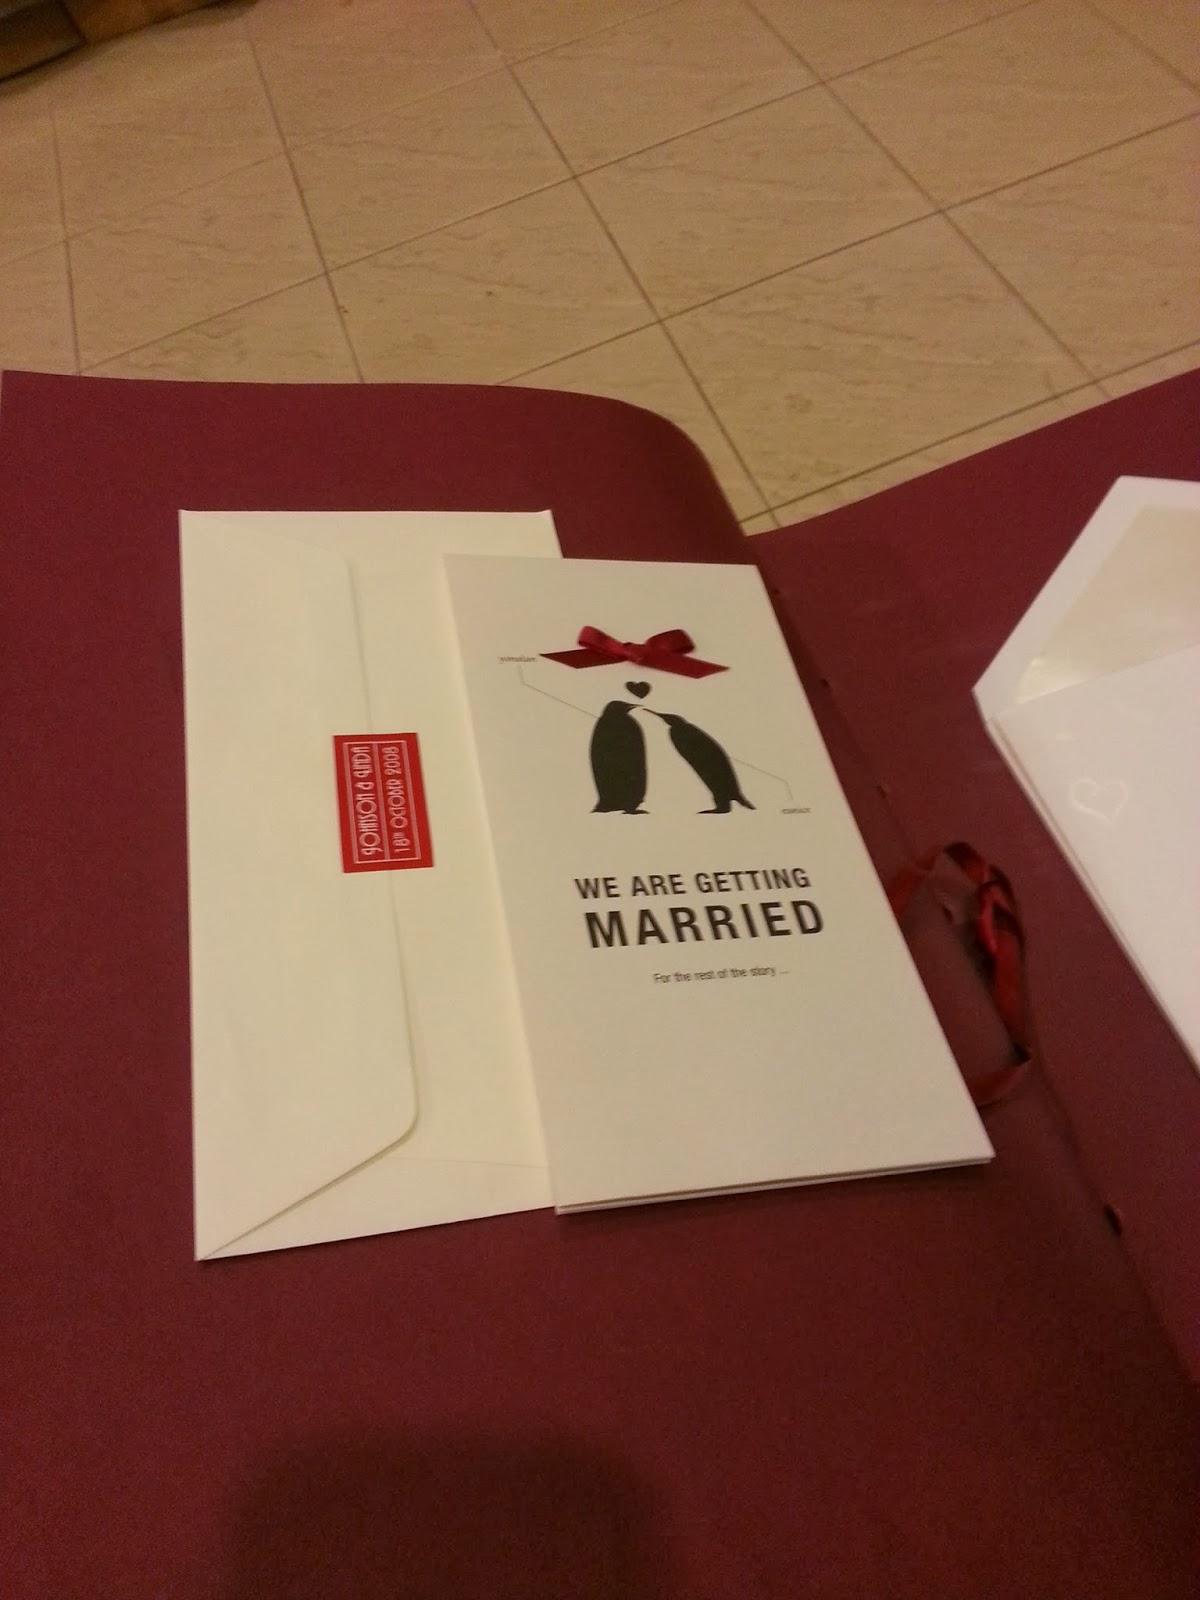 Live Laugh Love Blest: Project Managing Your Wedding - Part 1